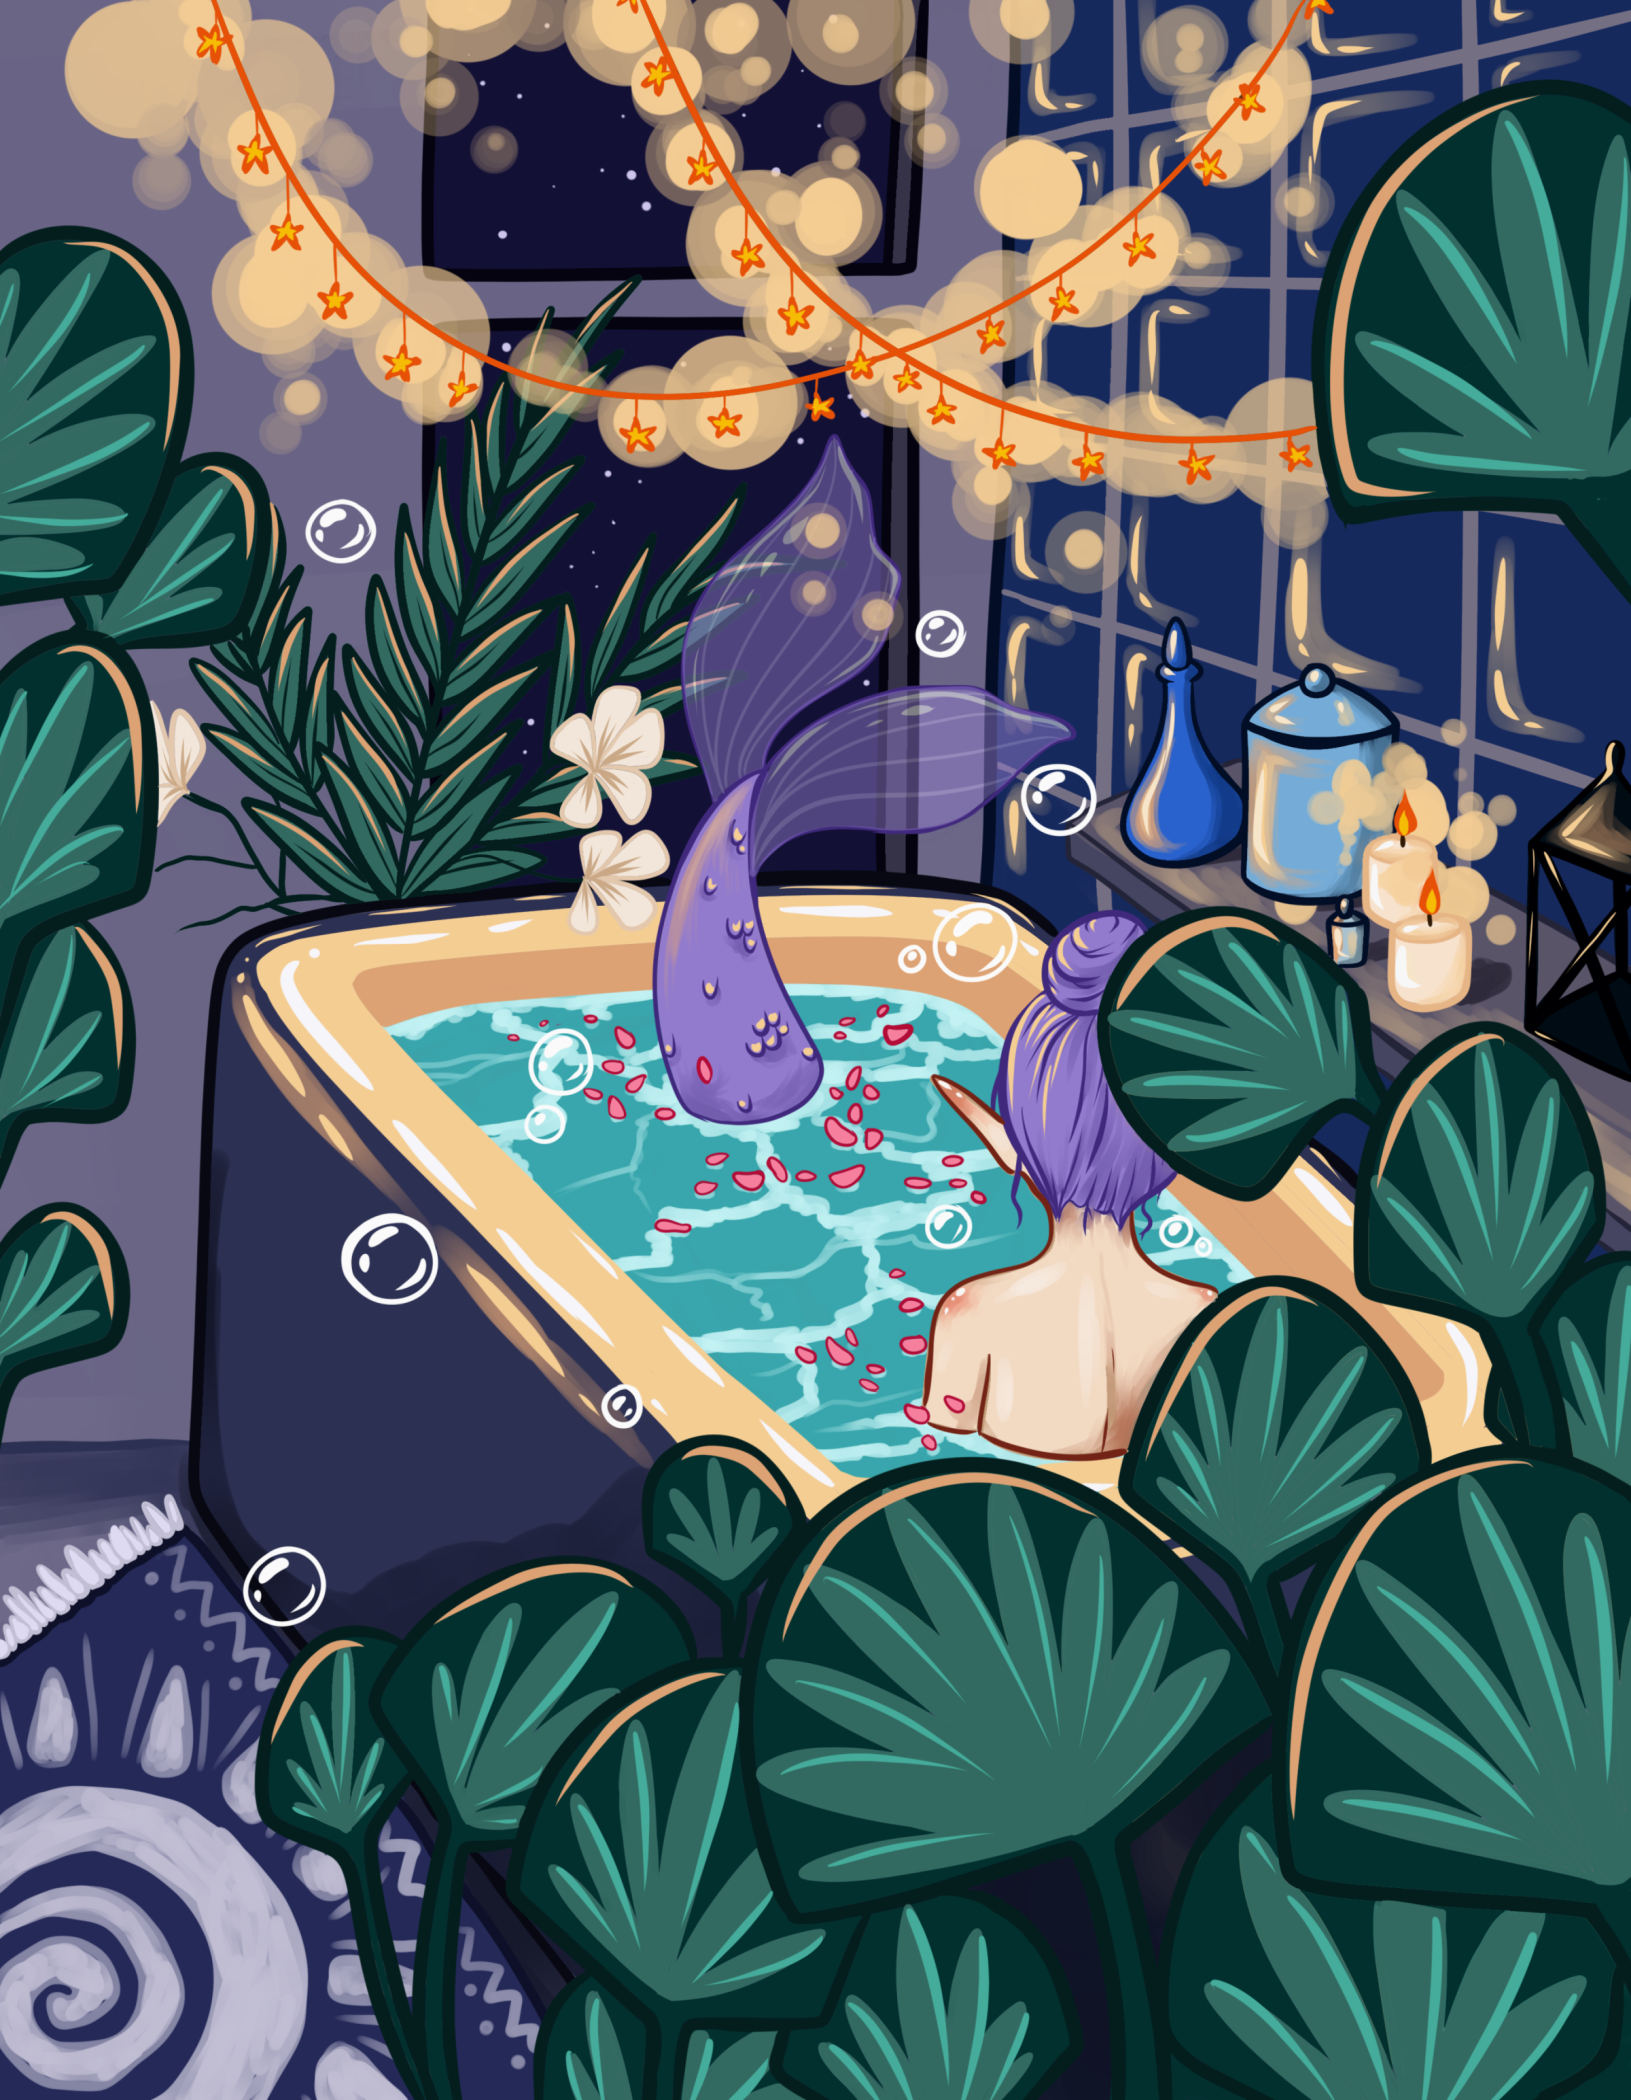 mermaid bath.jpg 5 x 7